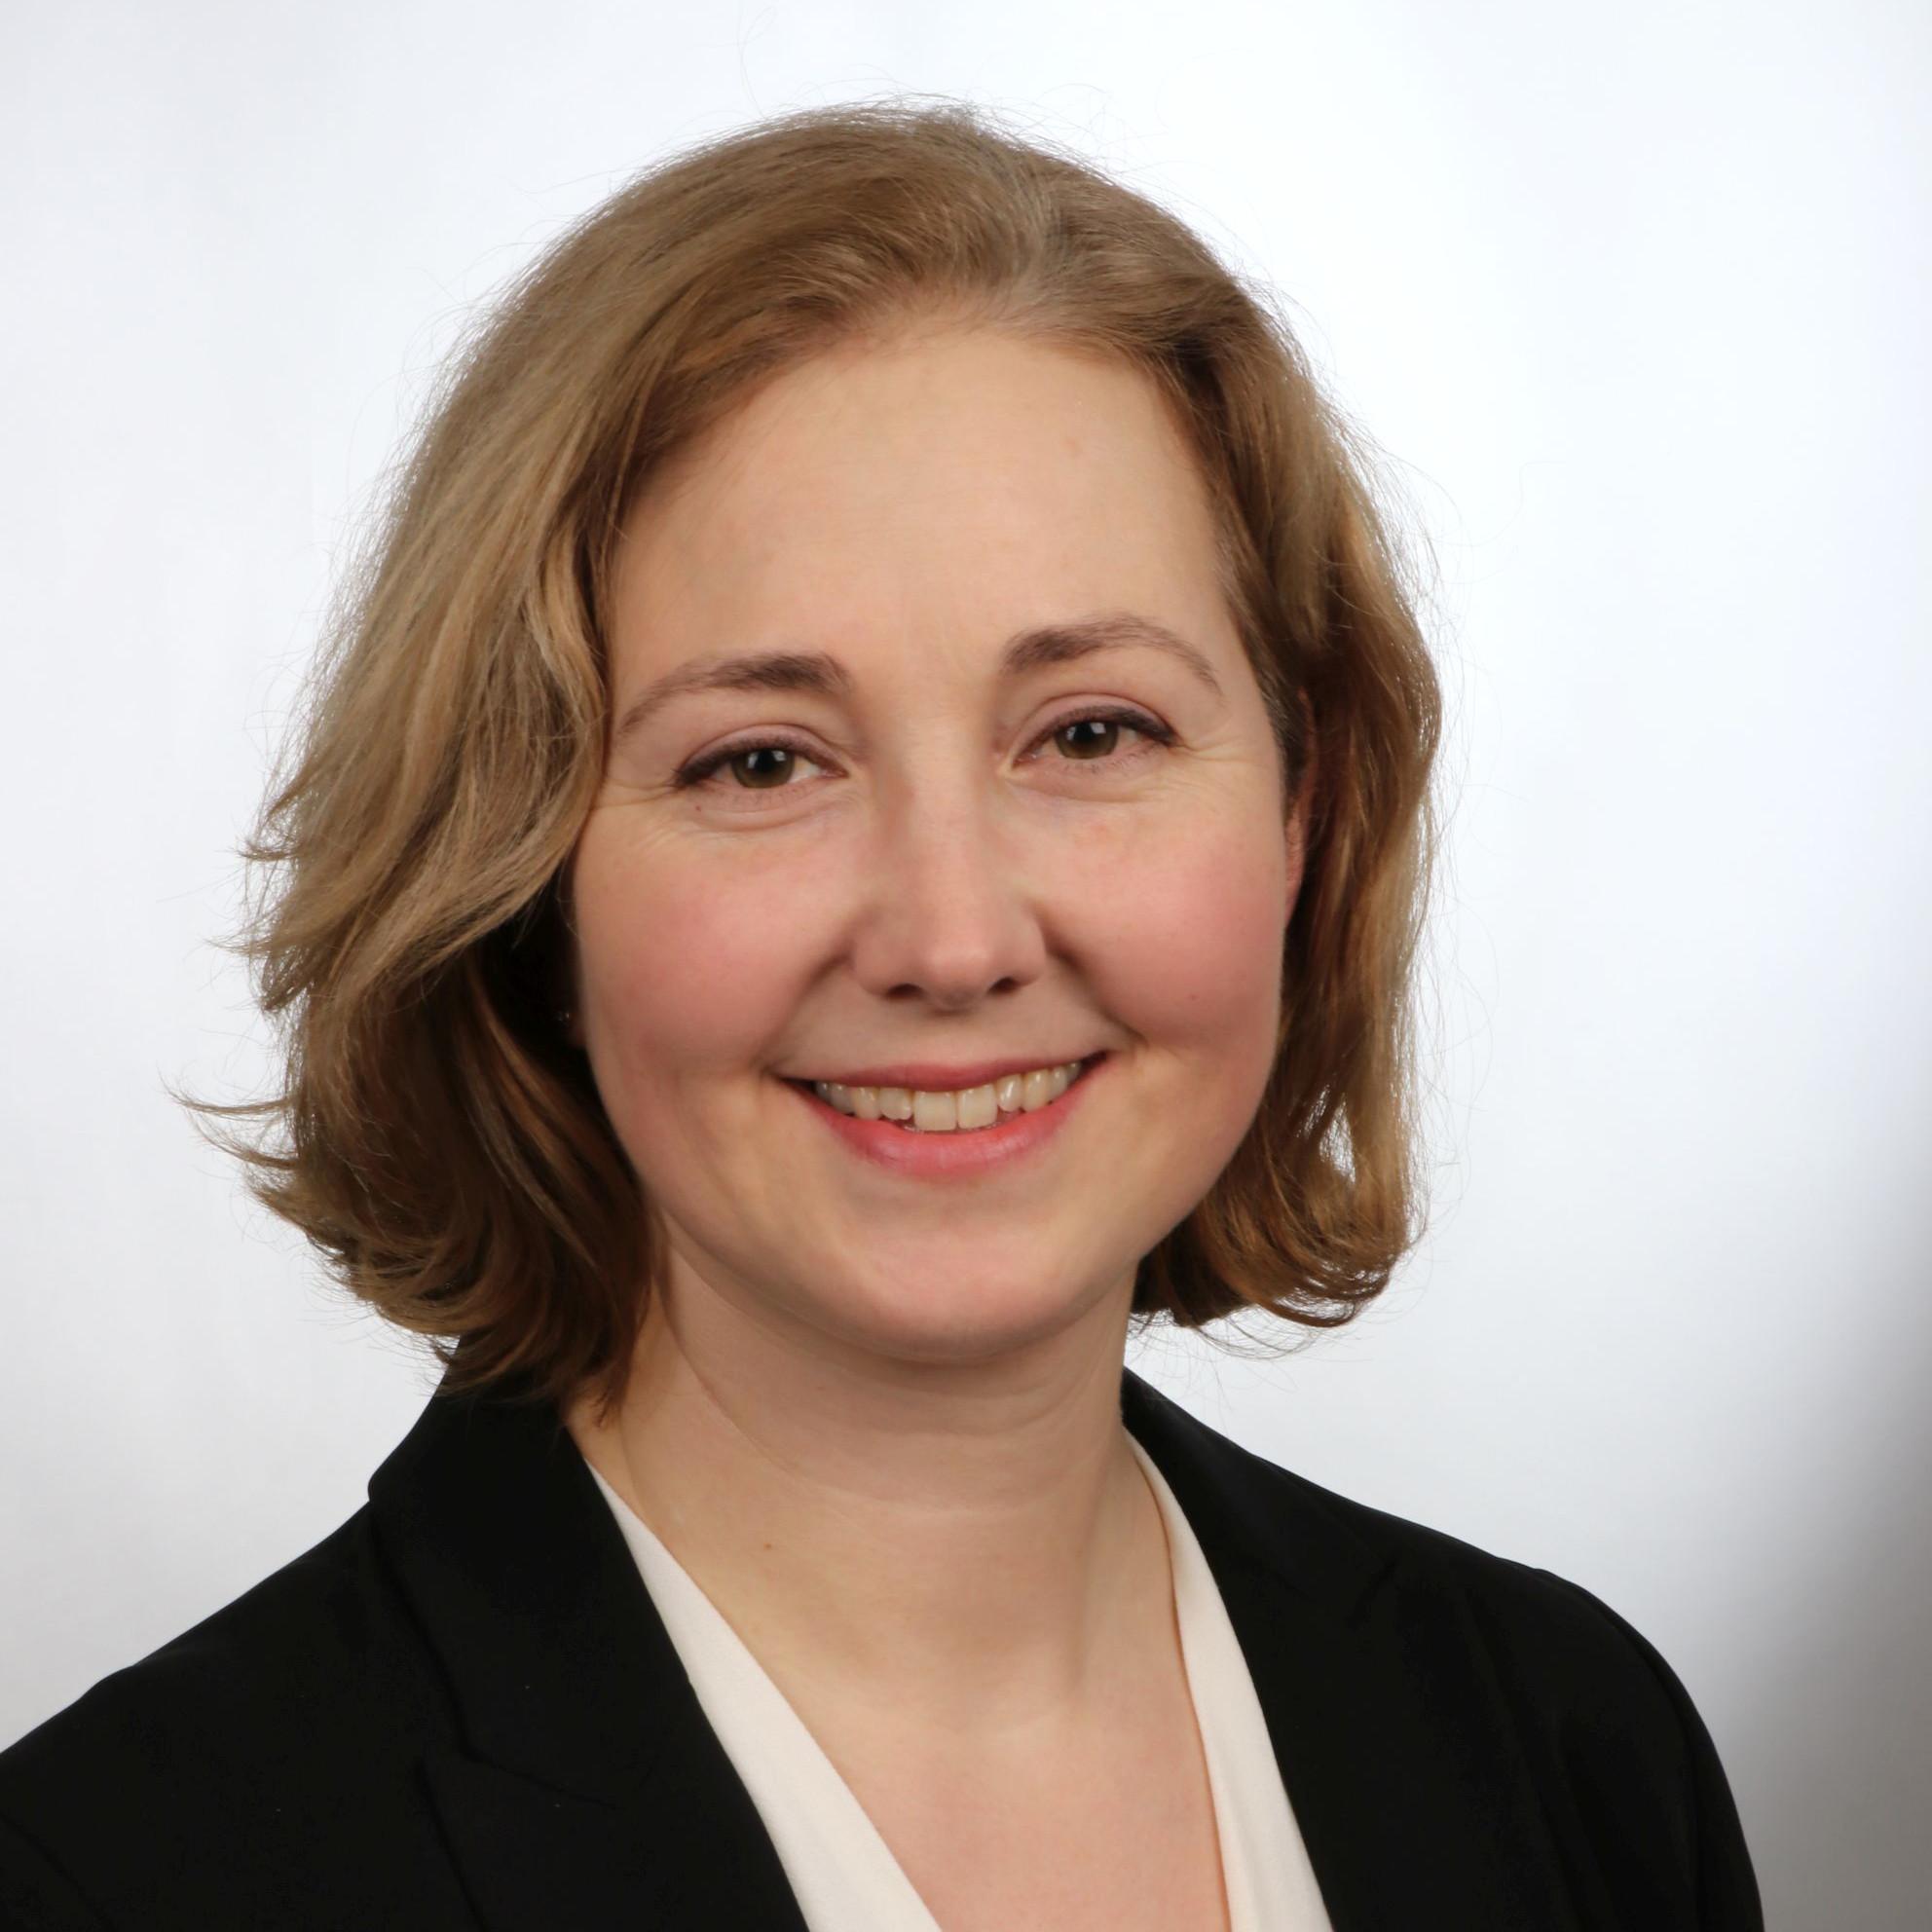 Corinna Hohnsbeen